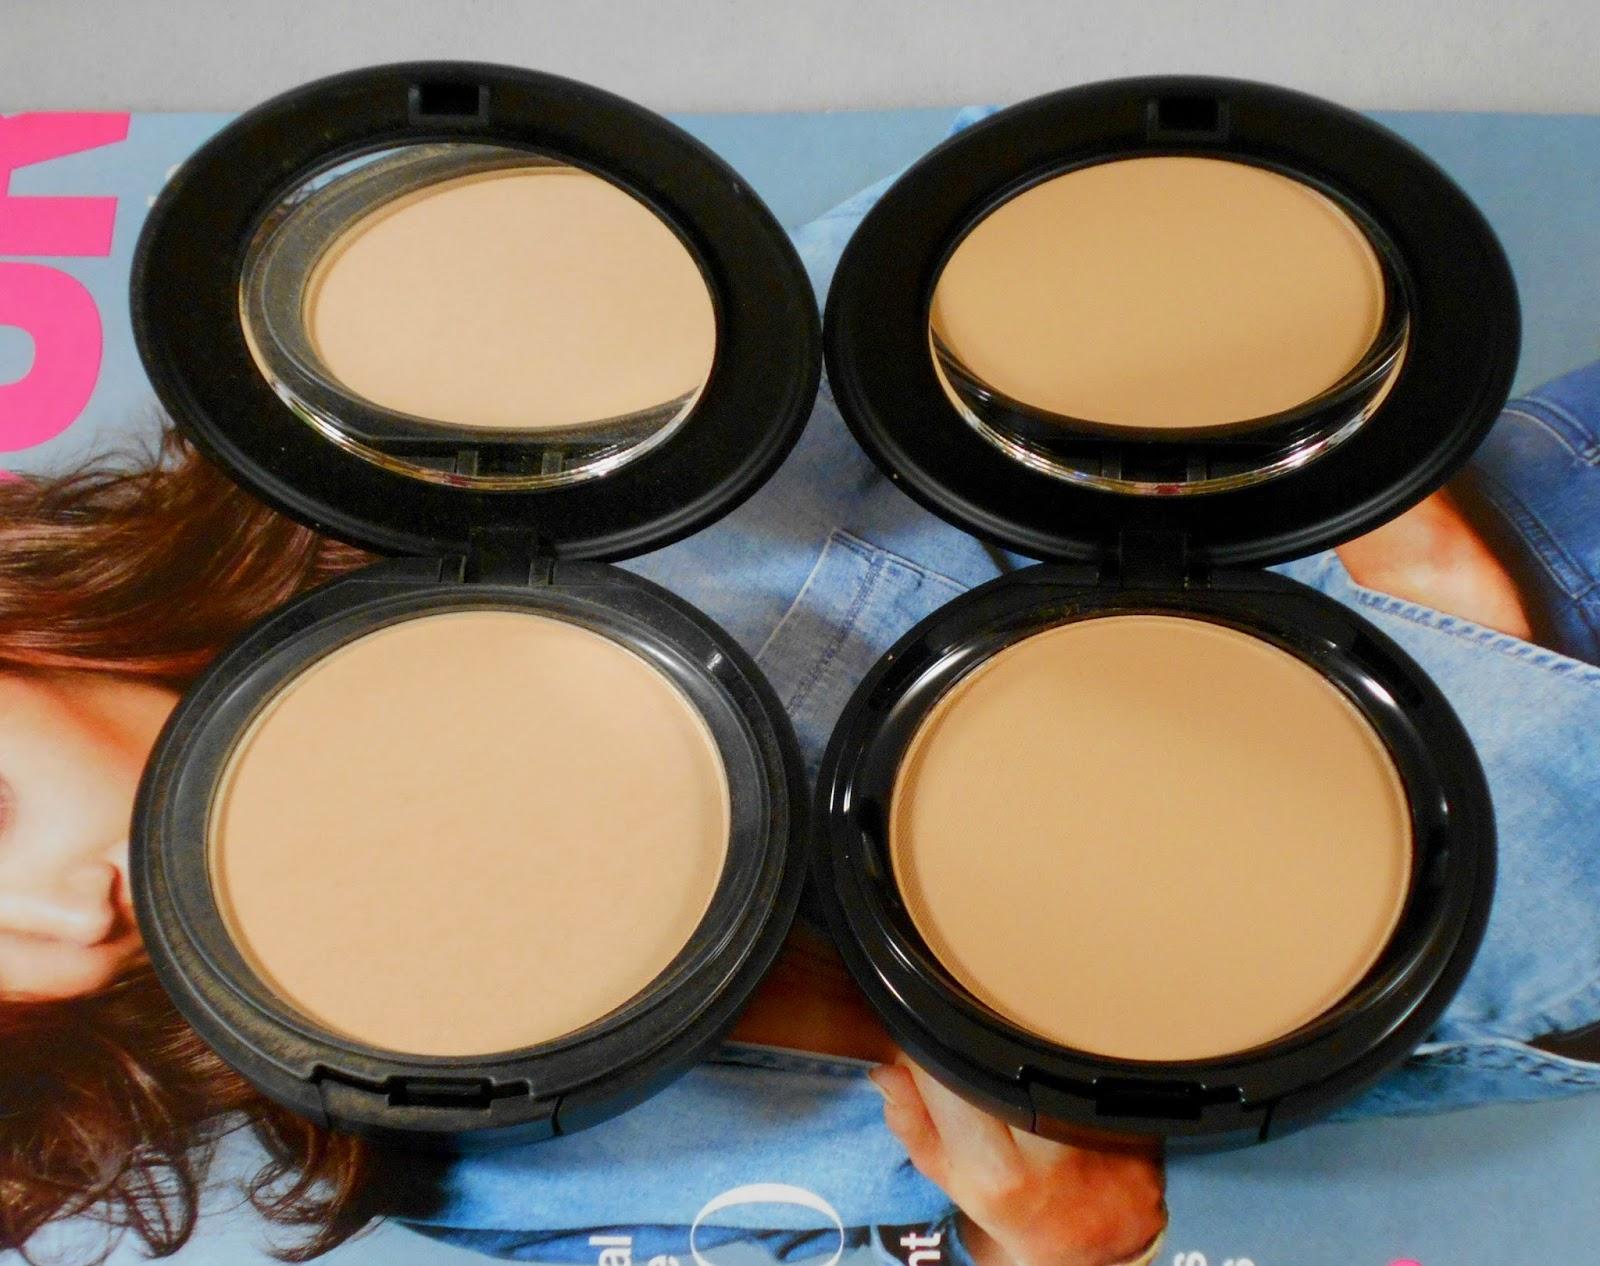 BH Cosmetics Studio Pro Matte Finish Pressed Powder